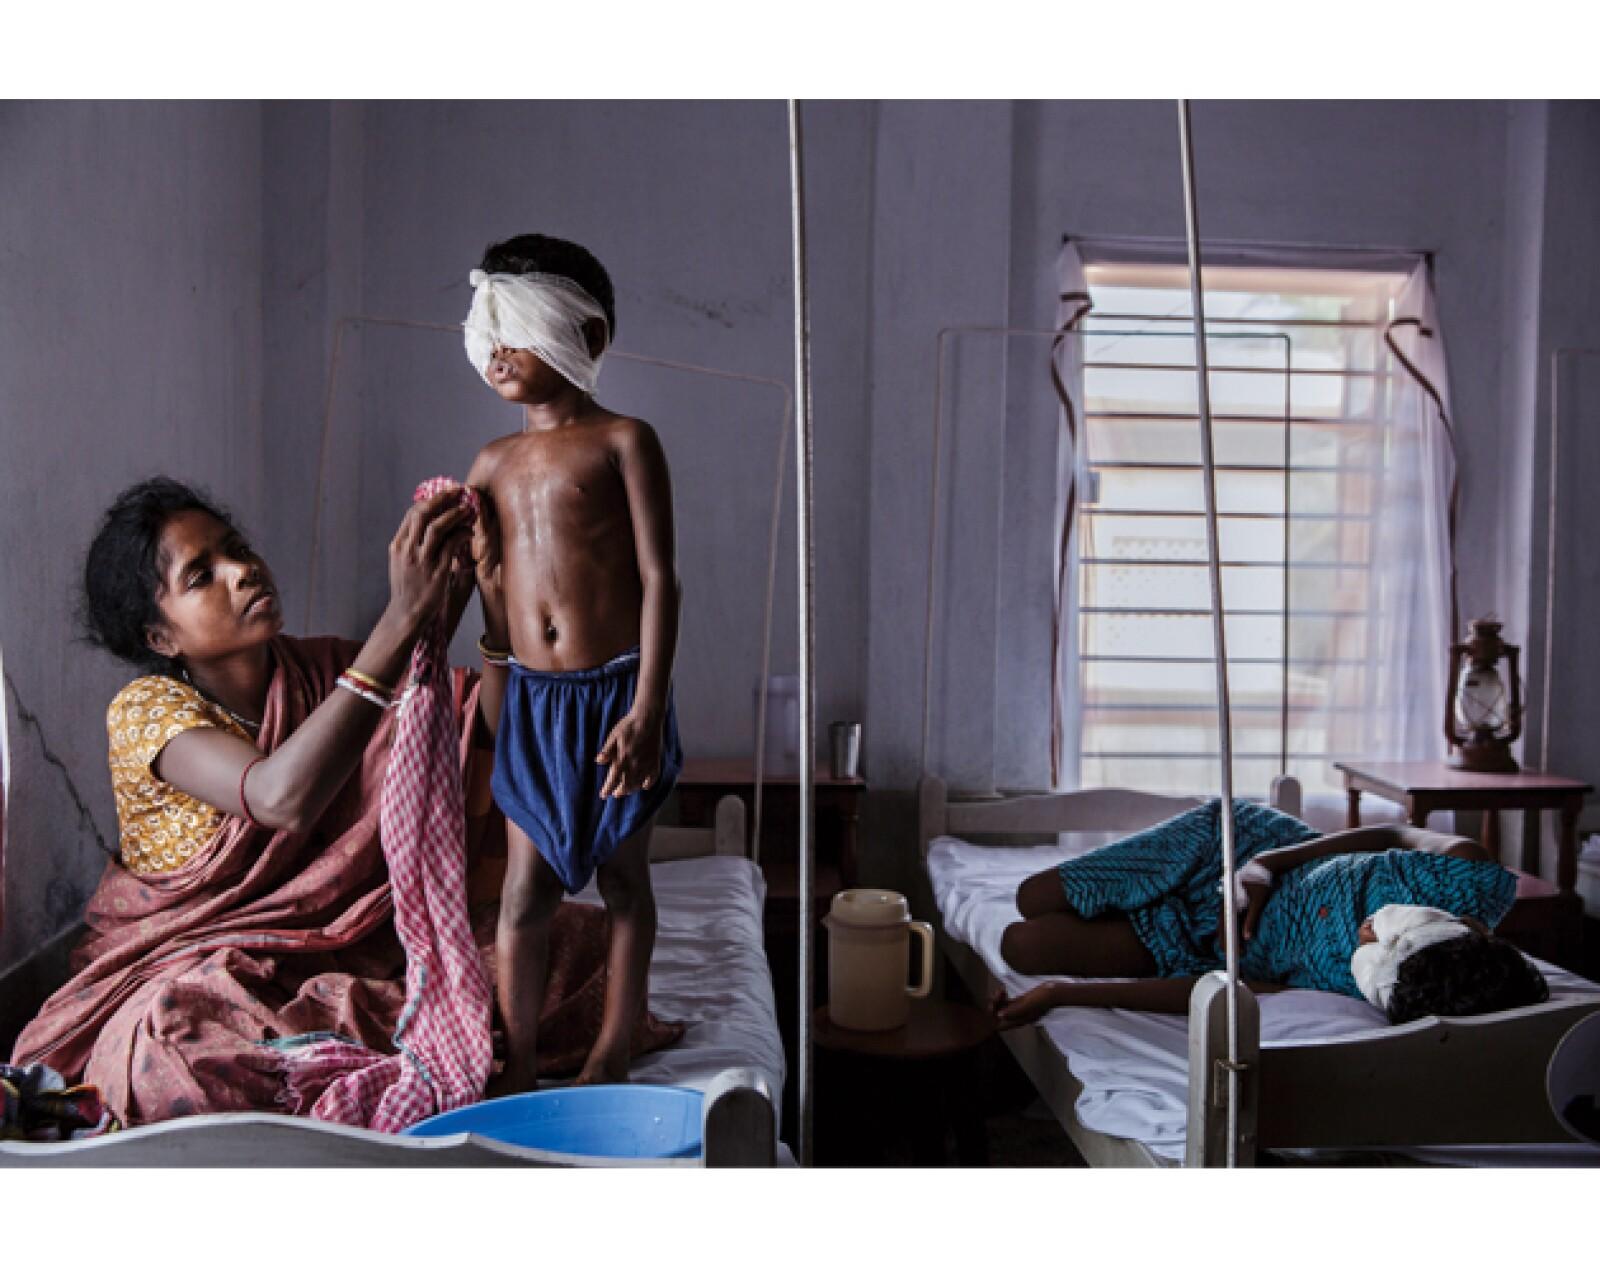 Brent Stirton (Sudáfrica) - Profesional - Sucesos contemporáneos